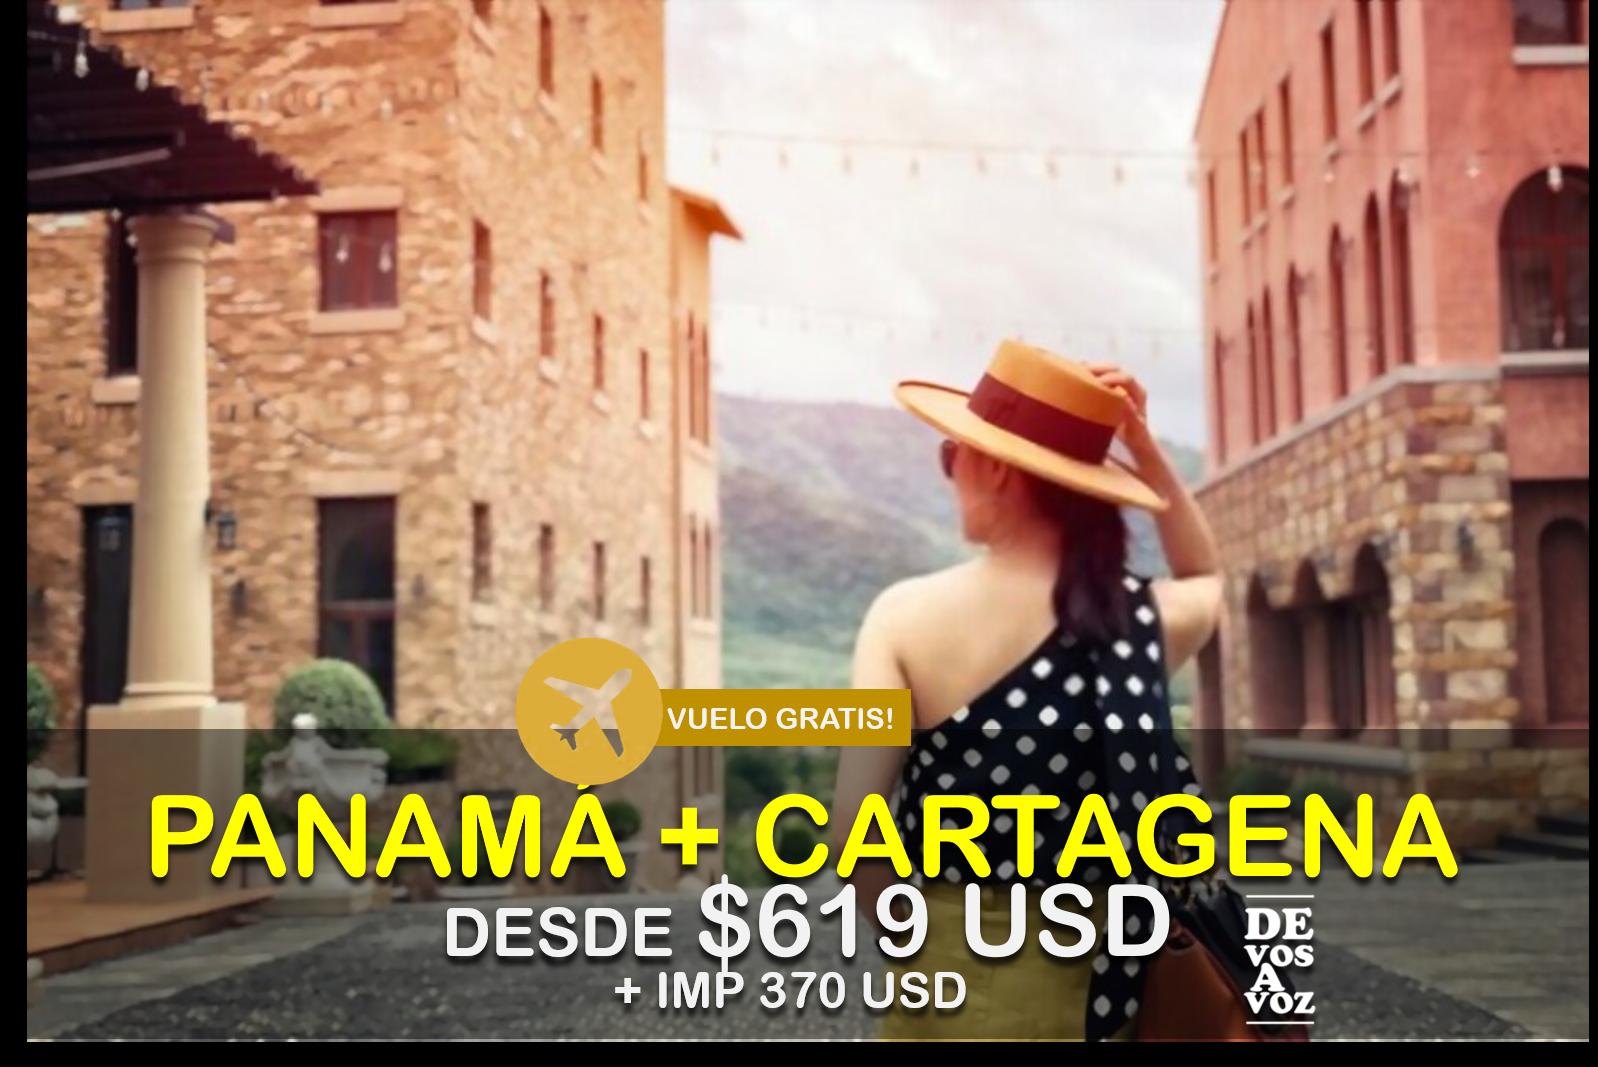 PANAMA + CARTAGENA